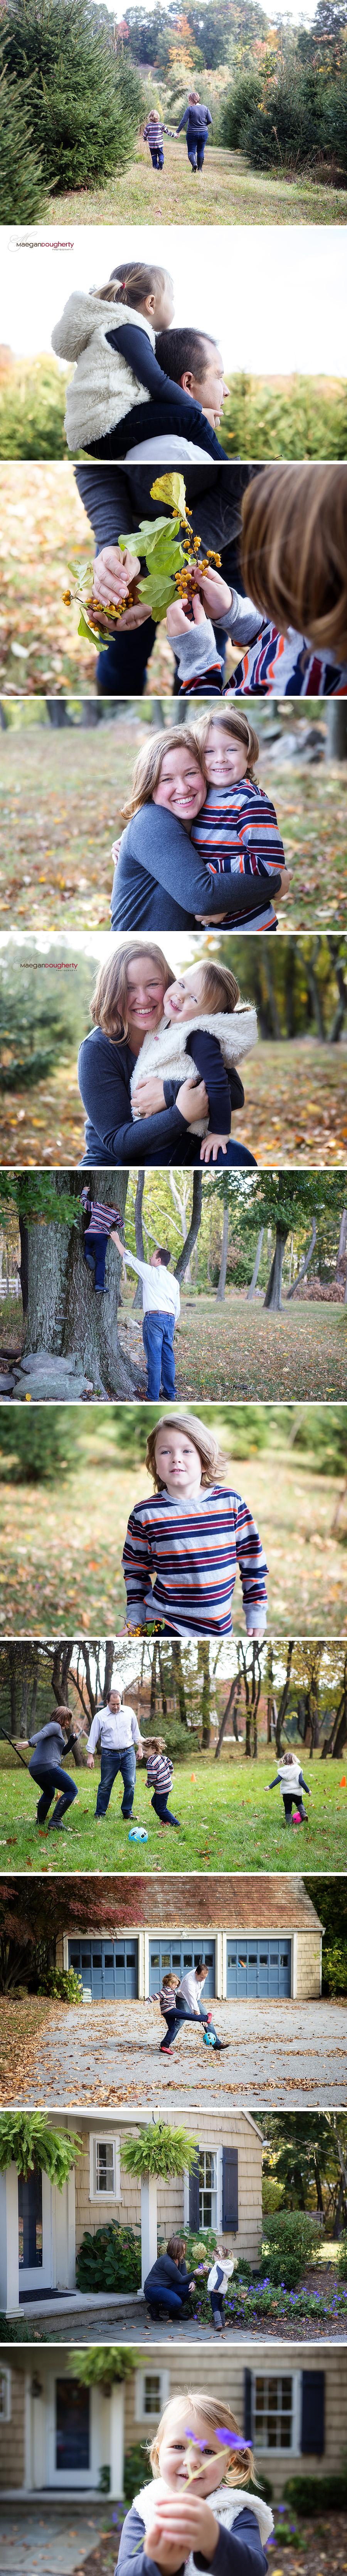 bergen county nj documentary family photographer